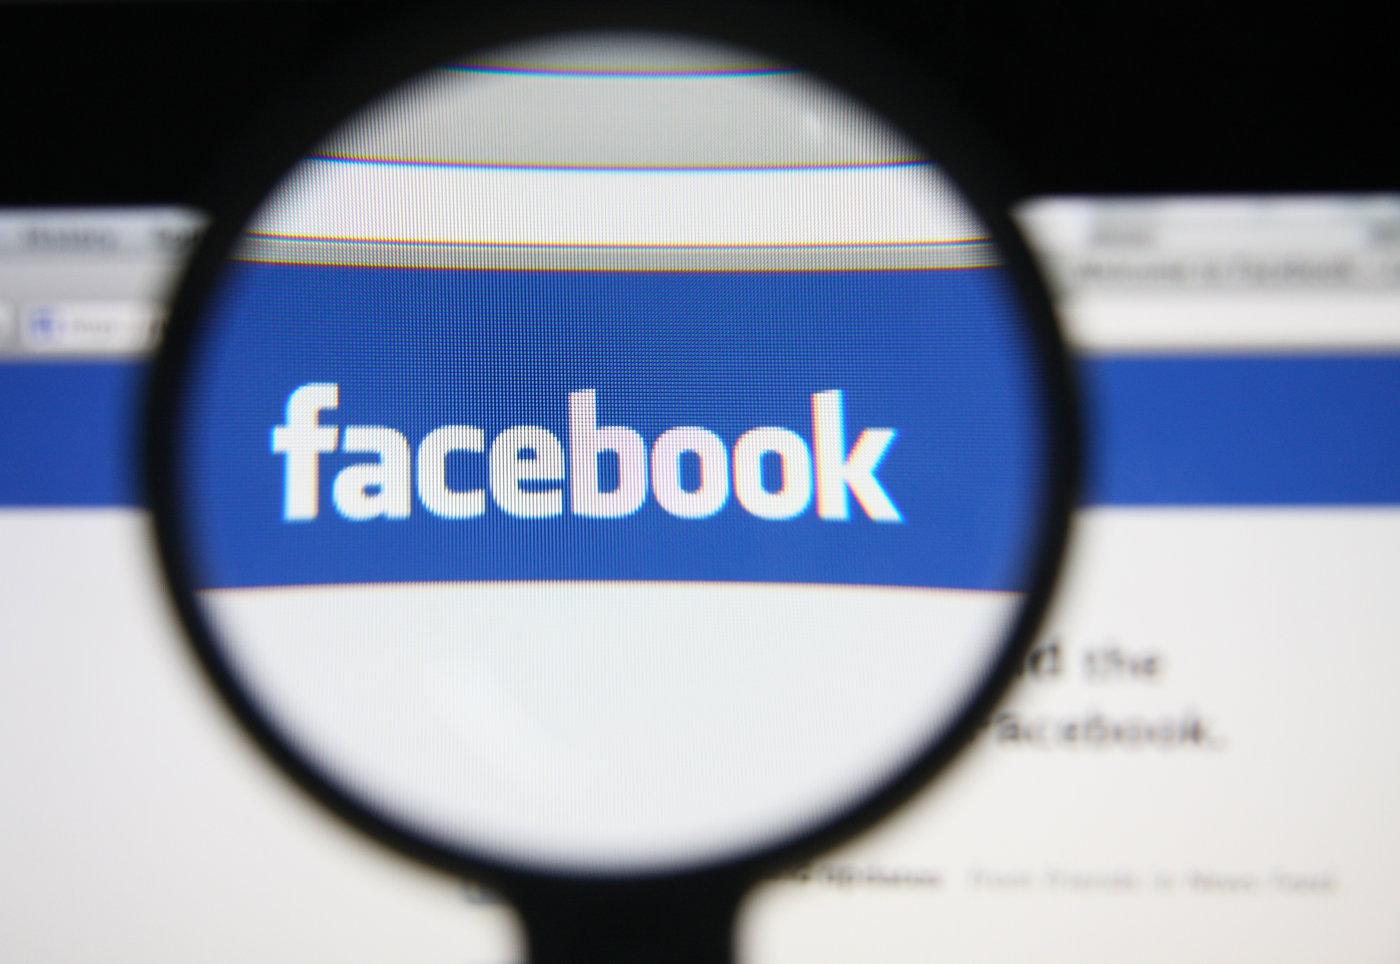 Robber arrested after Facebook suggests the victim adds him